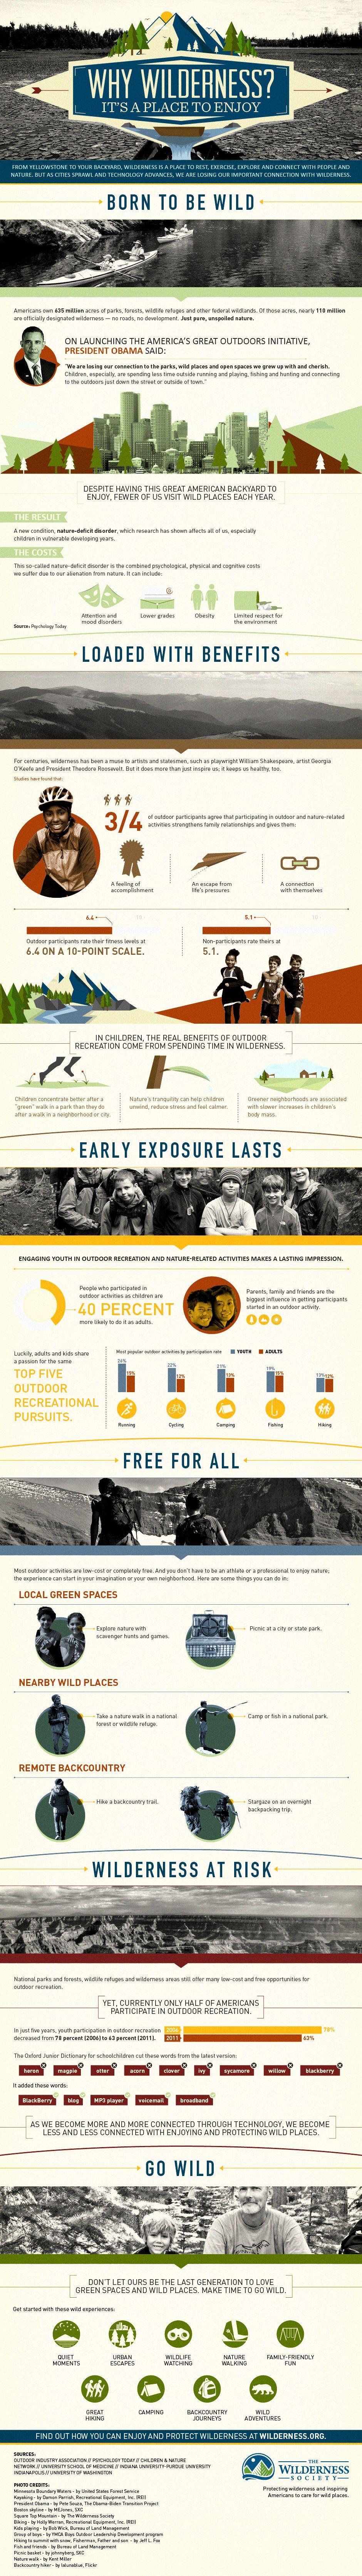 Why does wilderness matter? This infographic explains - Perché è importante la natura incontaminata? Questa infografica ce lo spiega